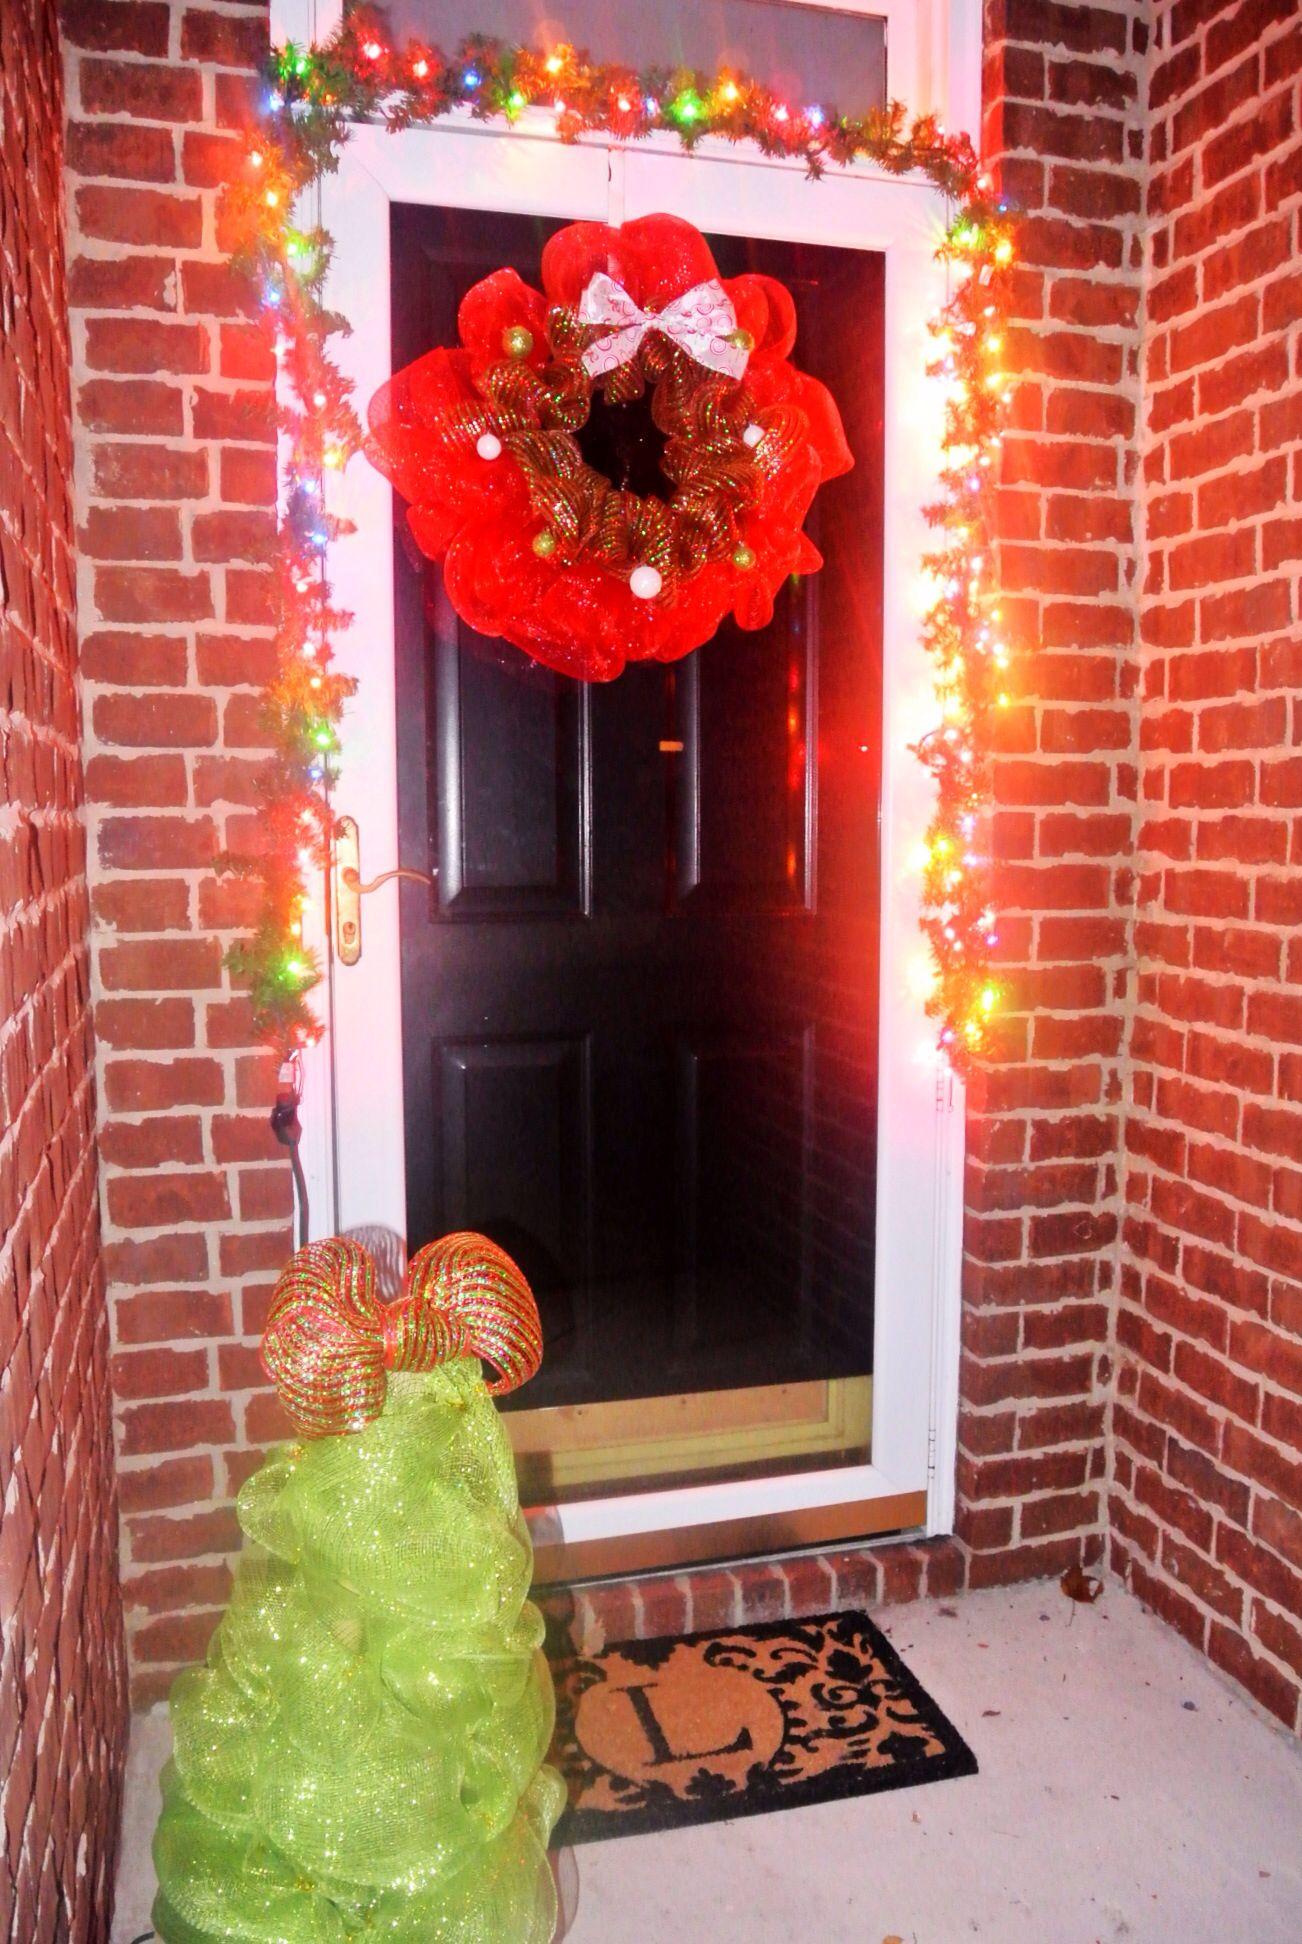 Deco mesh outdoor christmas decorations outdoor lights for Deco christmas decorations